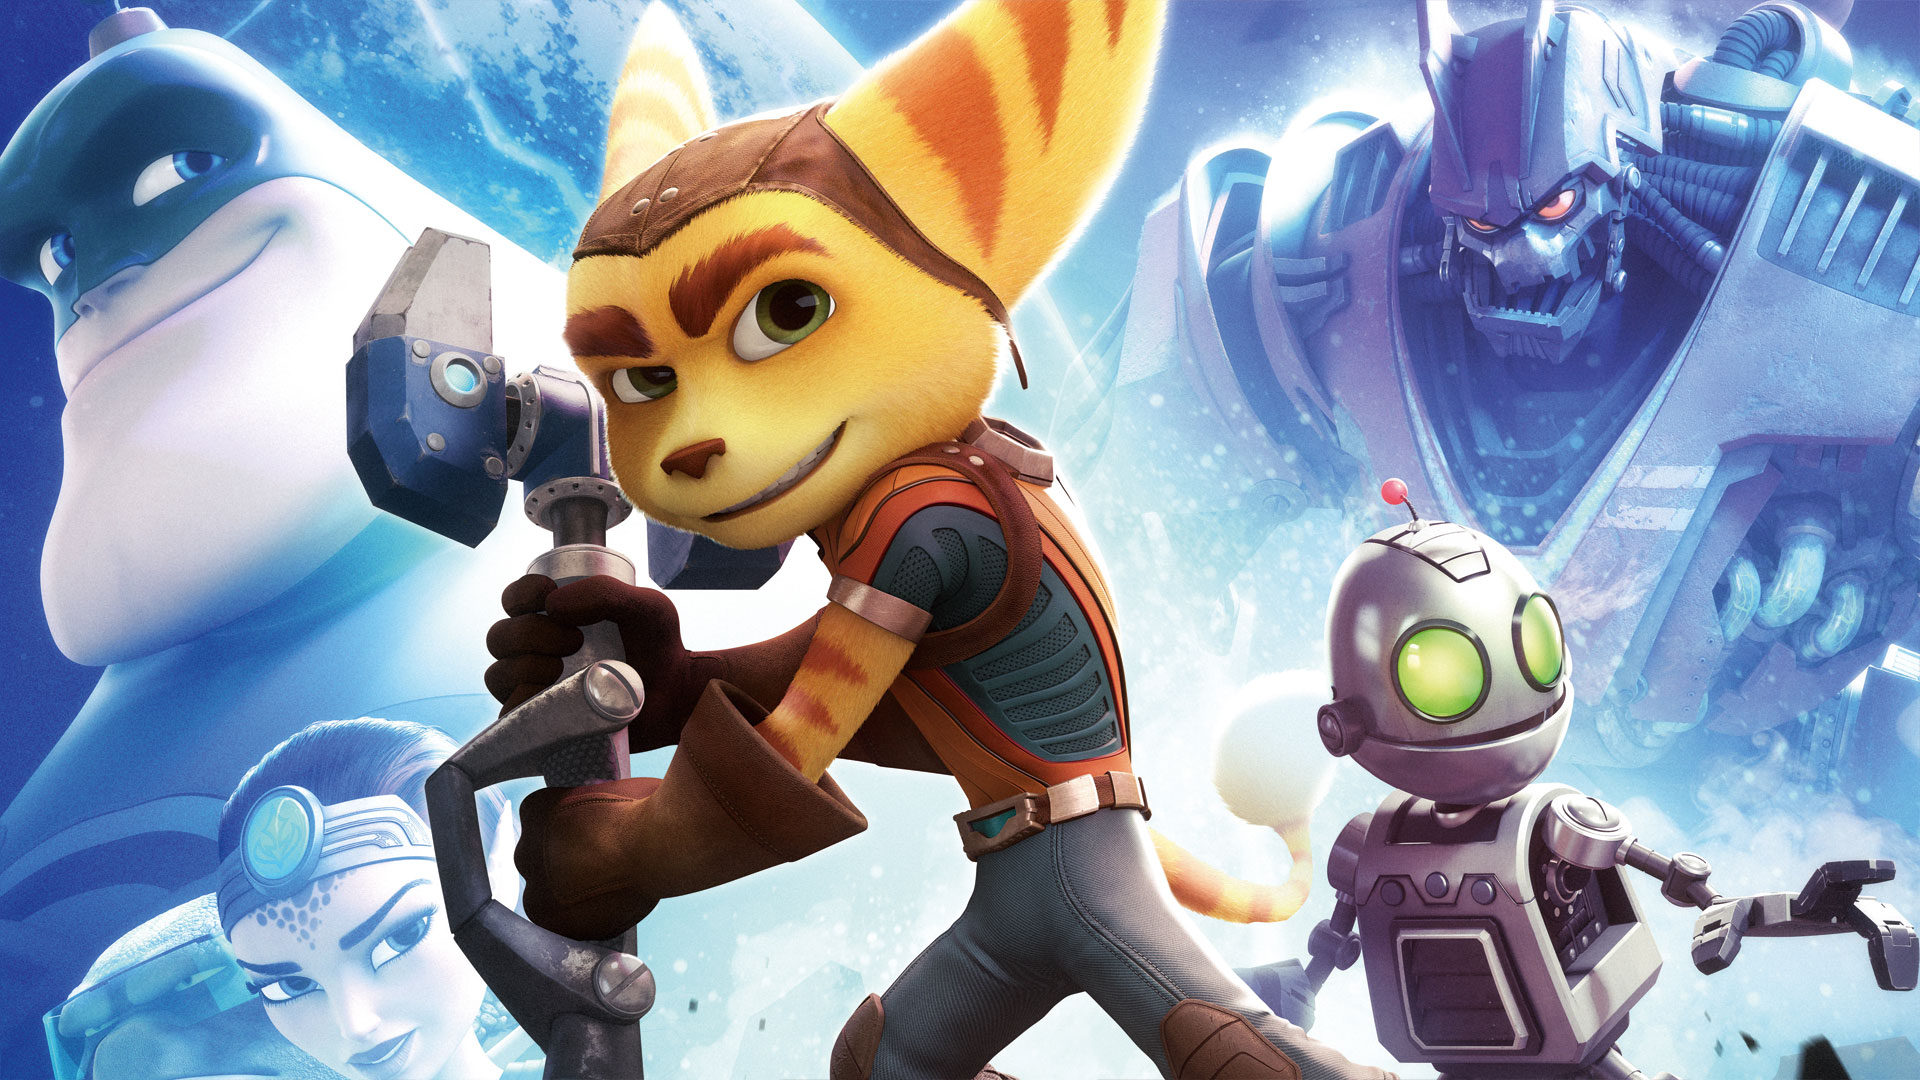 Portfolio tips for games artists - Ratchet & Clank